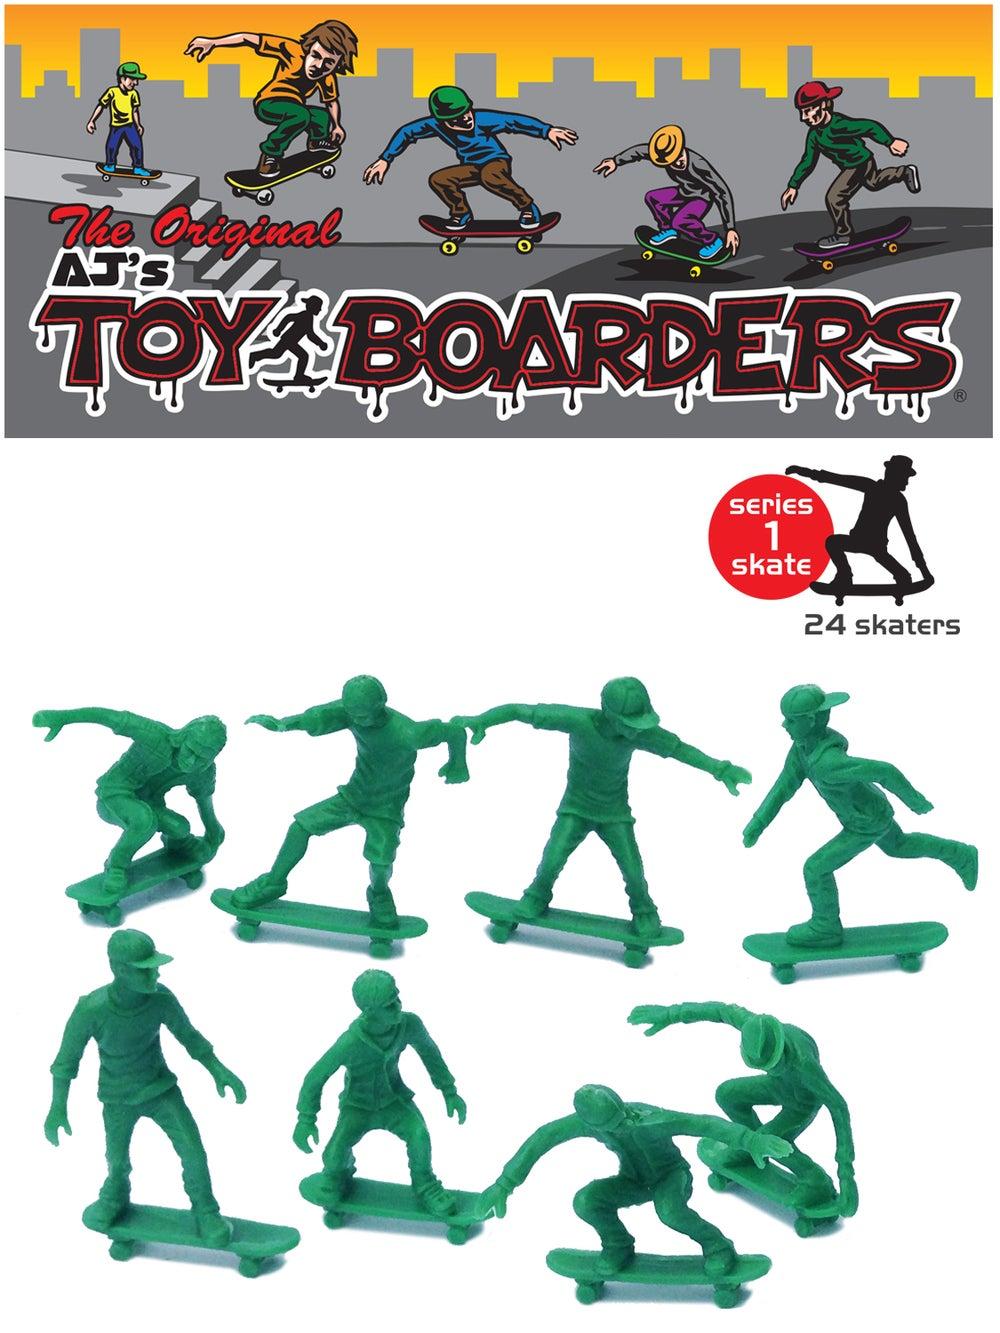 Image of Skate Series 1